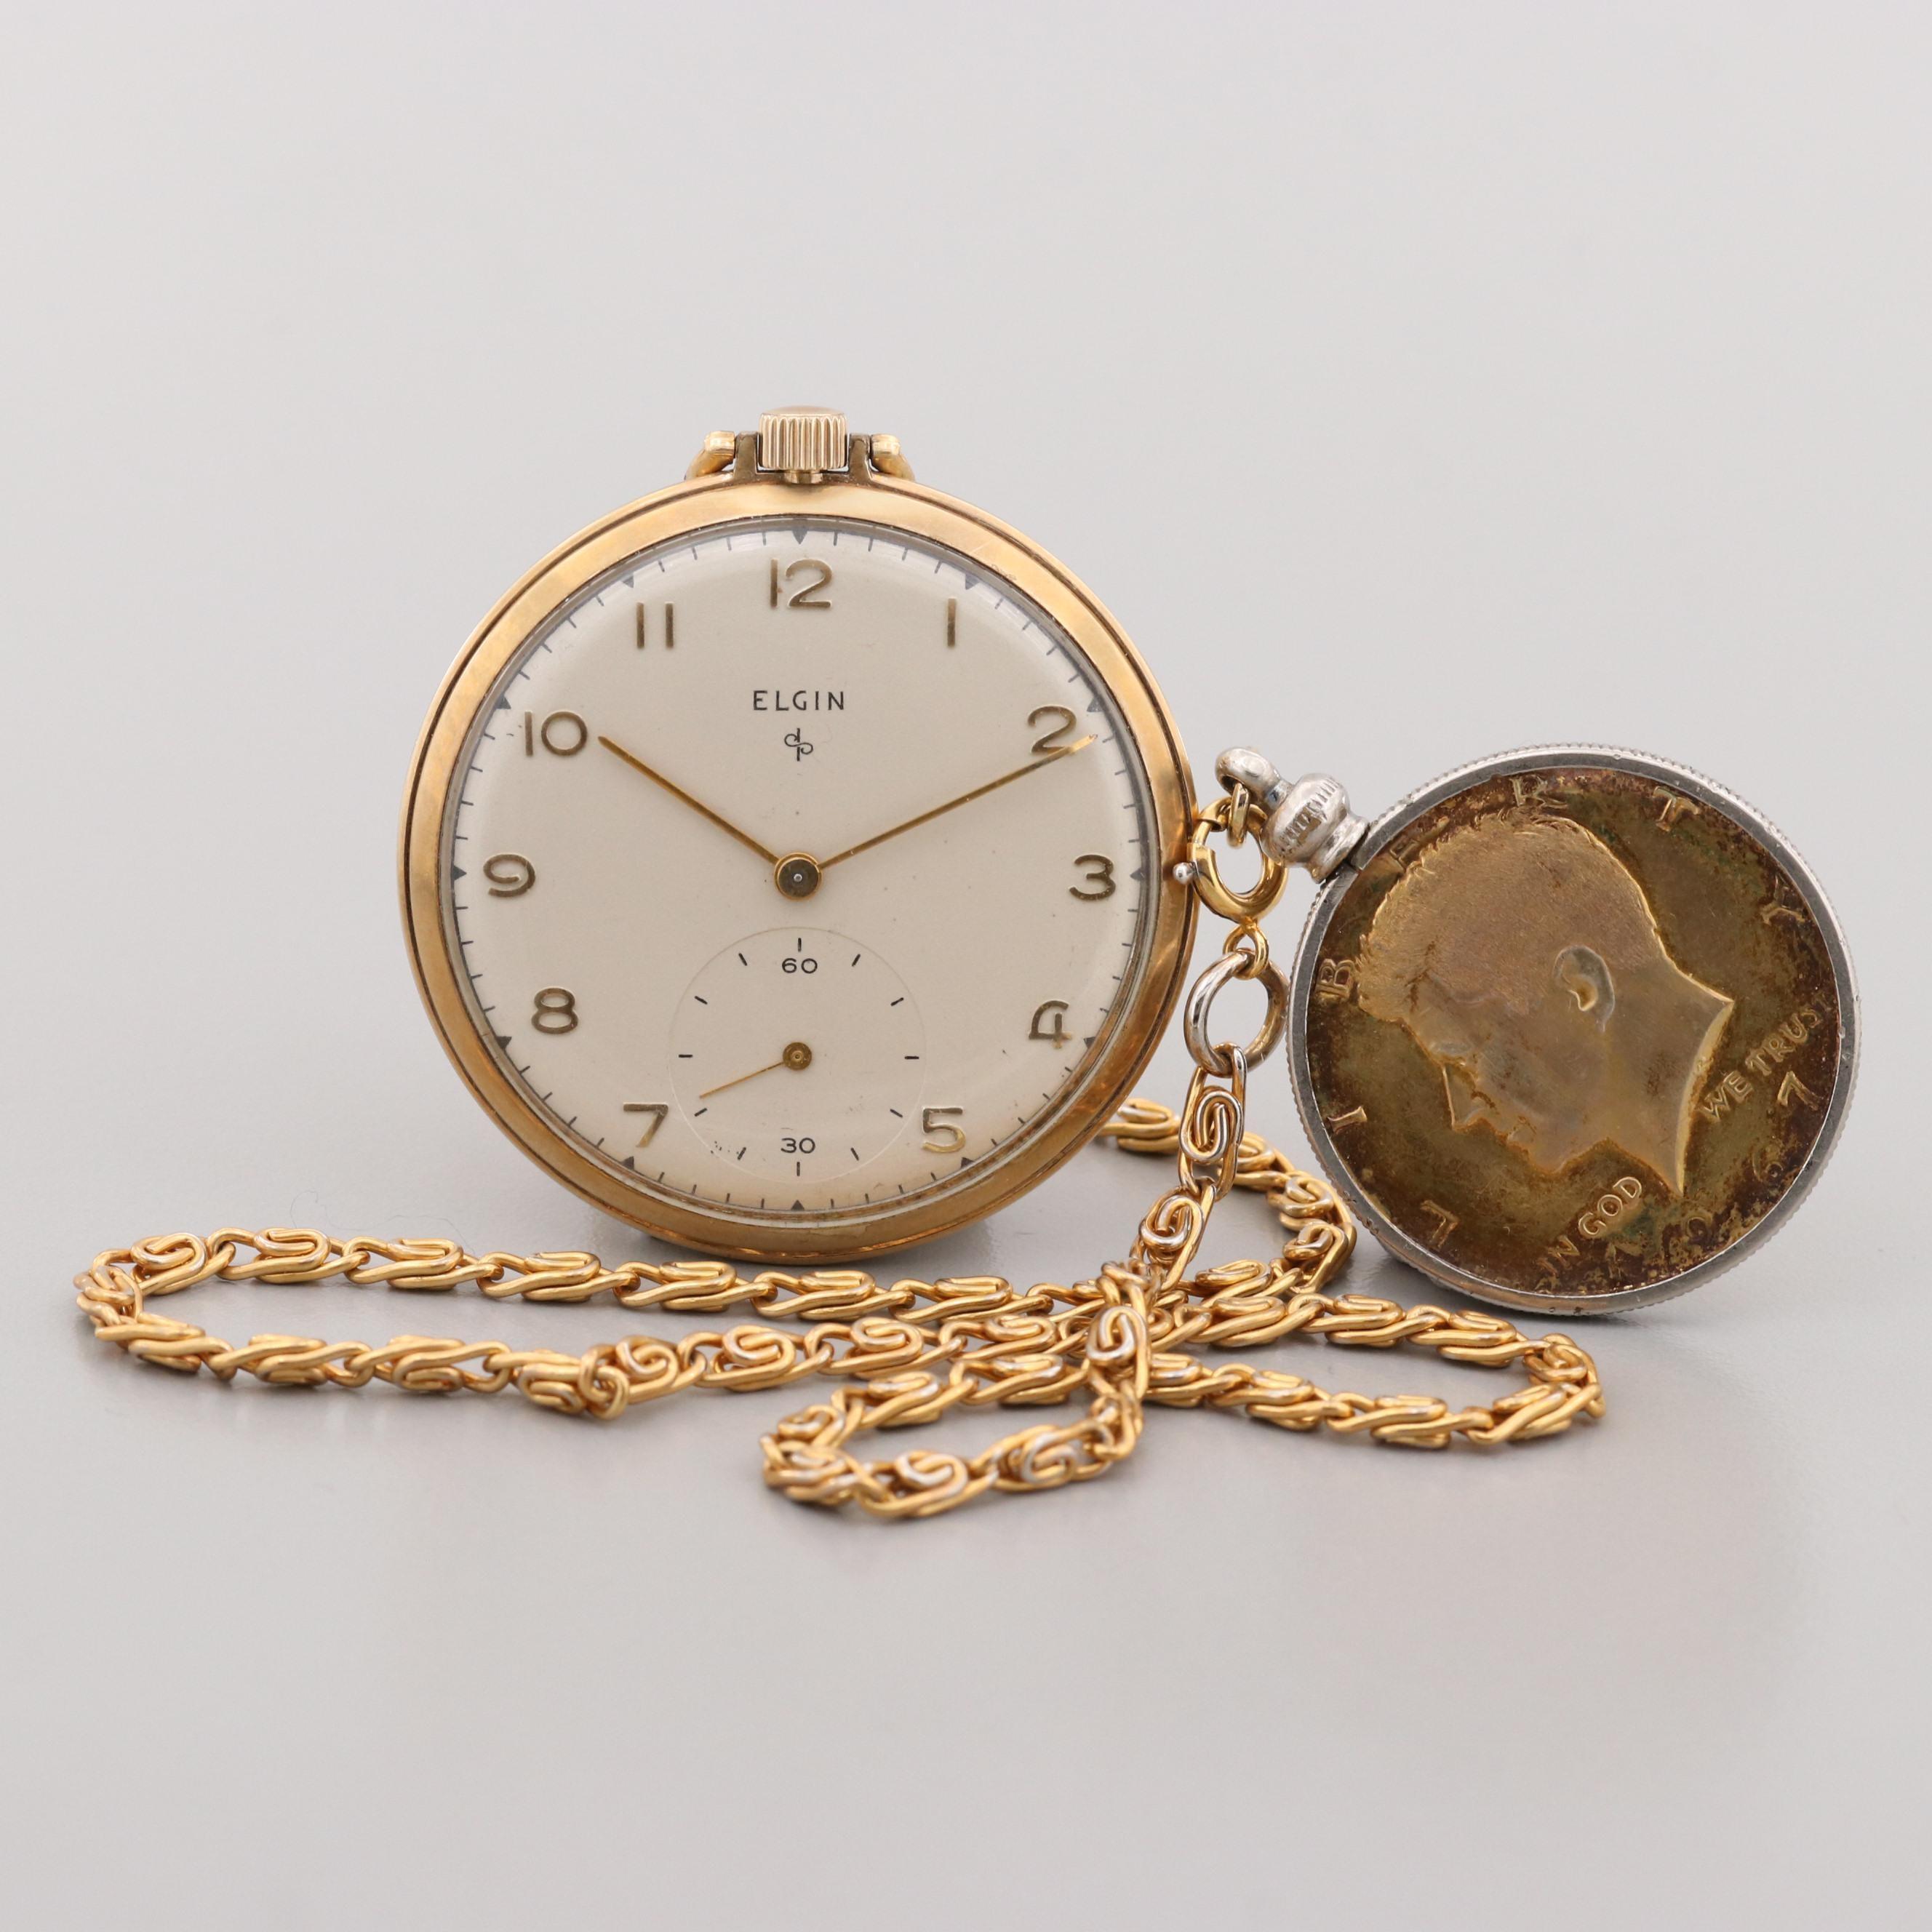 Elgin 10K Gold Filled Pocket Watch With Kennedy Half Dollar Fob Chain, 1949